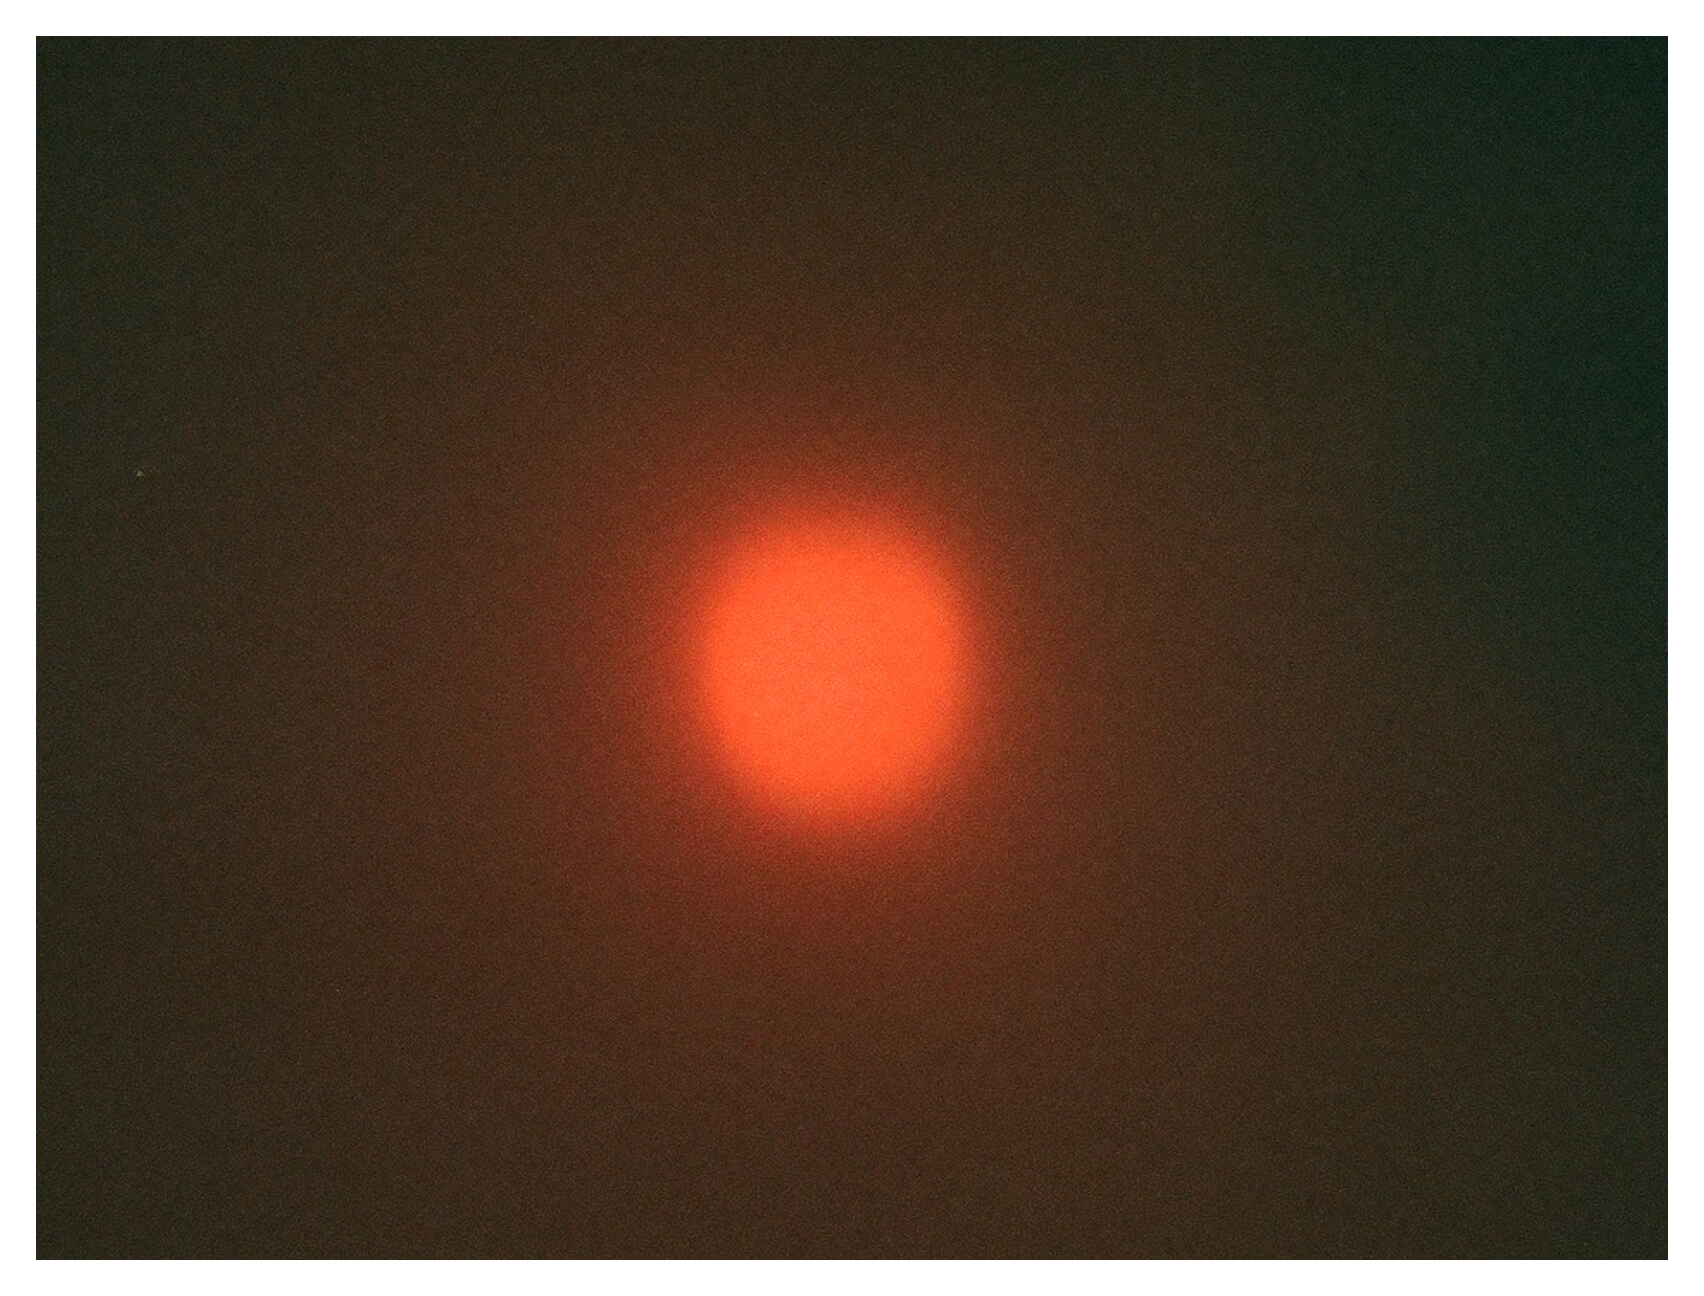 Eclipsed sun by Alyson Fox